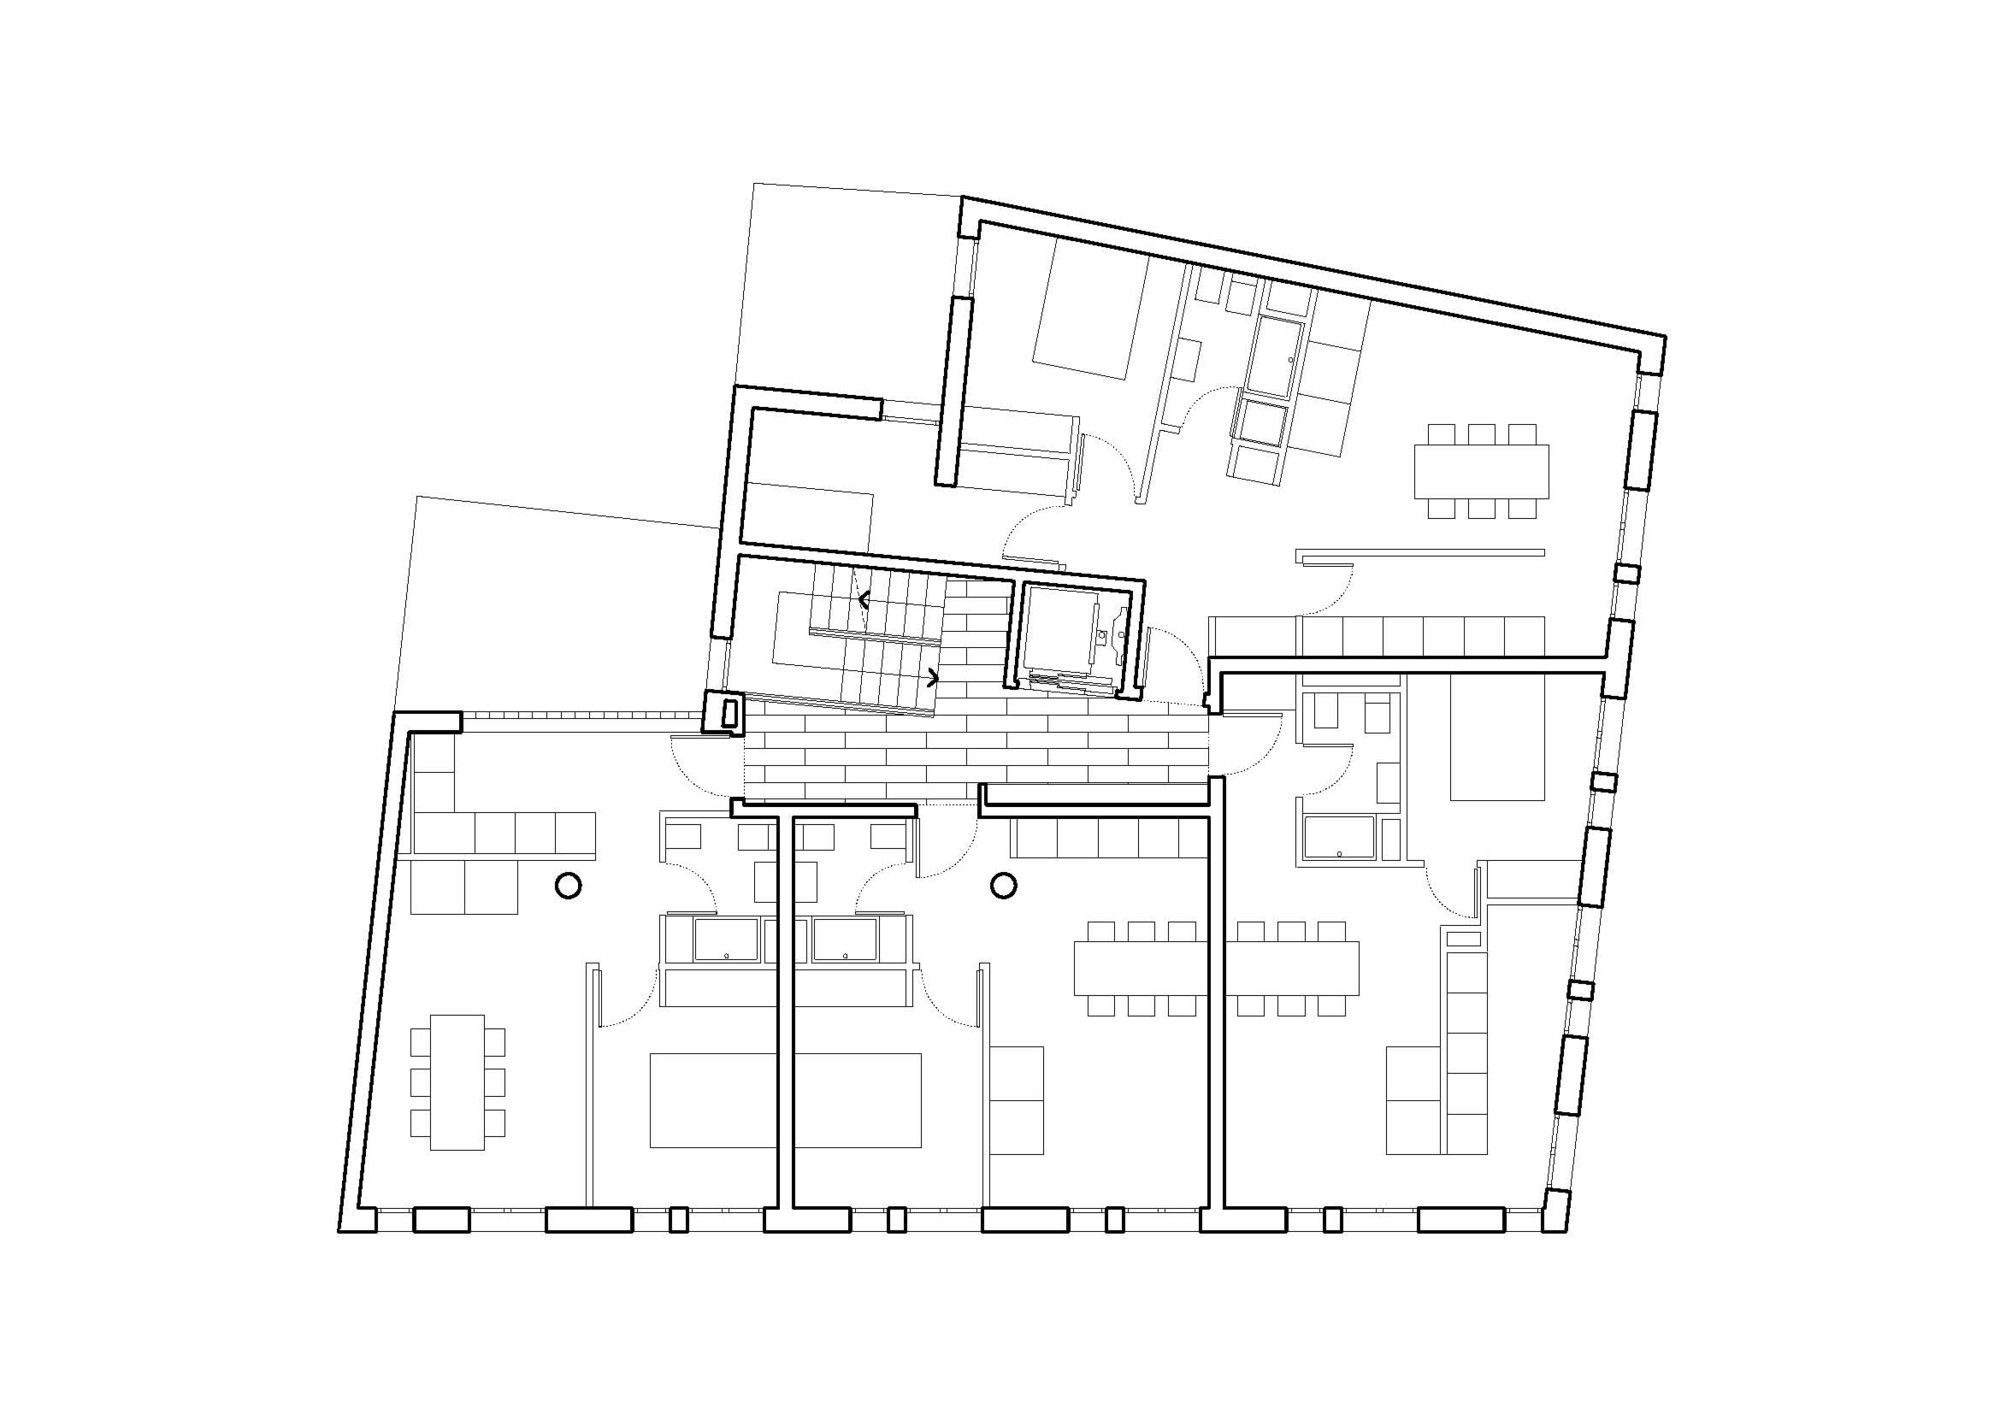 19 Dwellings on Viana Street / García Floquet Arquitectos